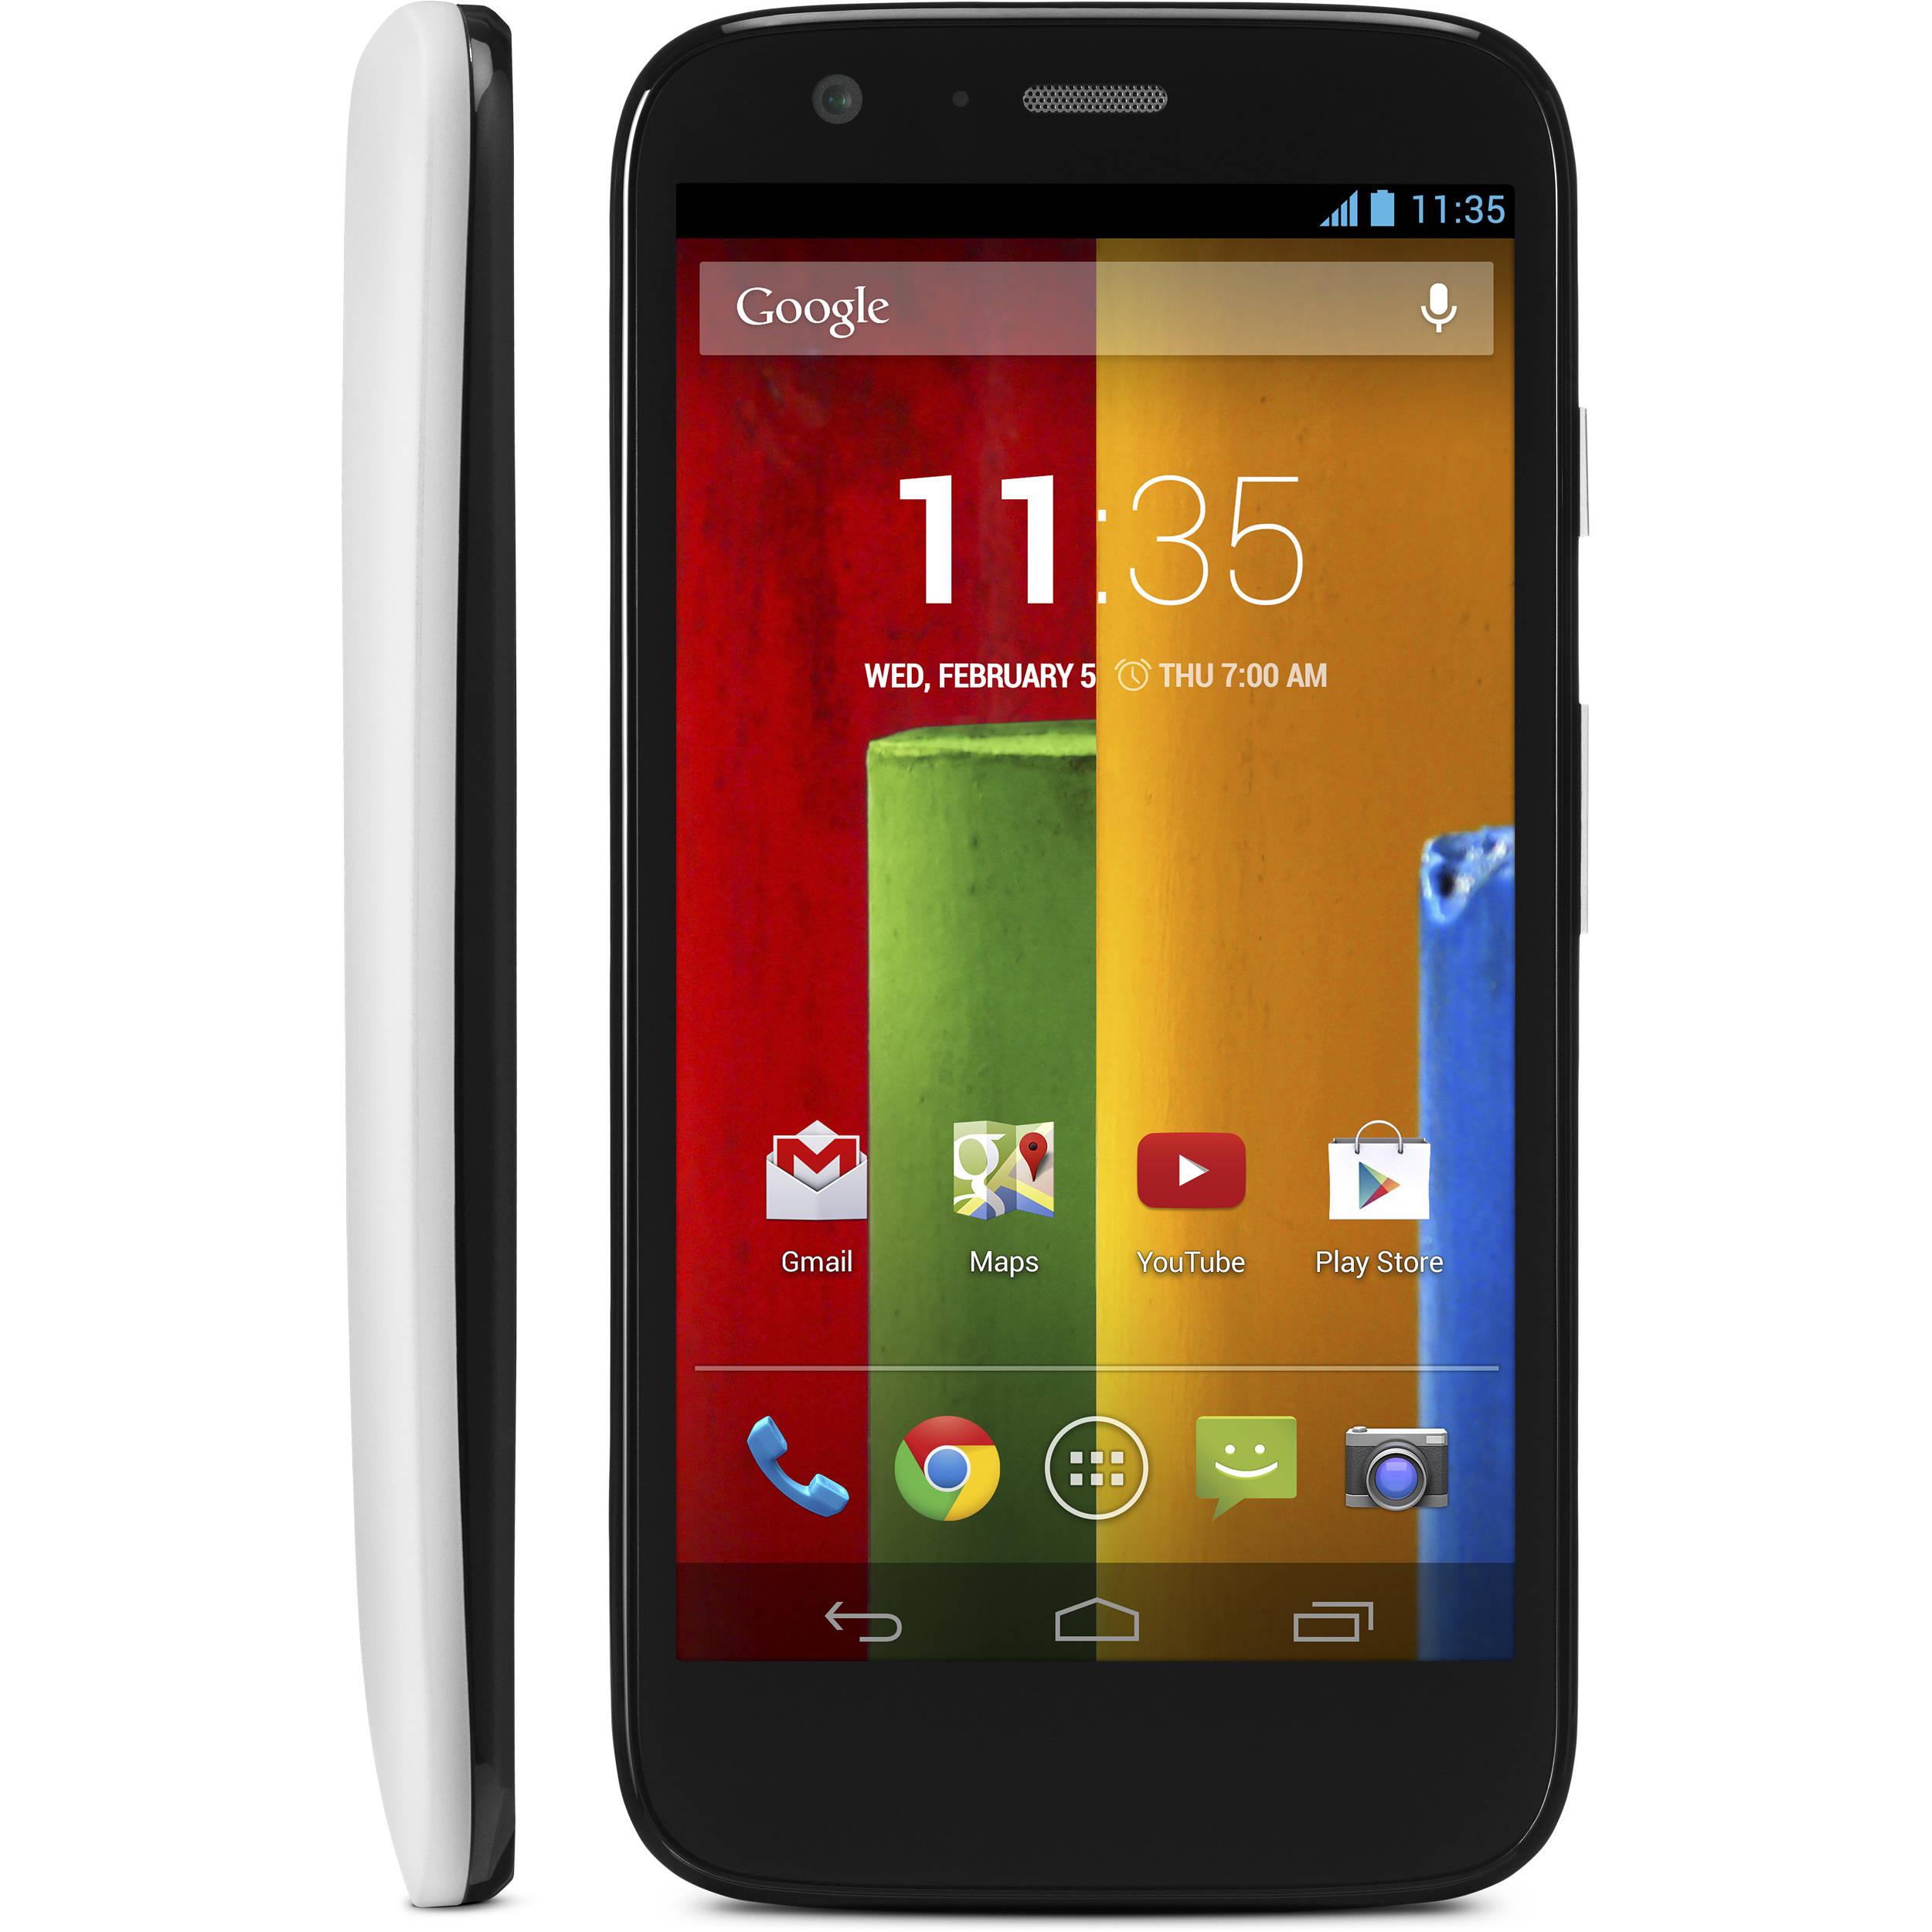 Moto G Xt1045 First Gen 8gb Smartphone 00432naecom Bh Xiaomi Redmi Note 2 4g Lte Dual Simcard Ram 1gb Internal Unlocked White